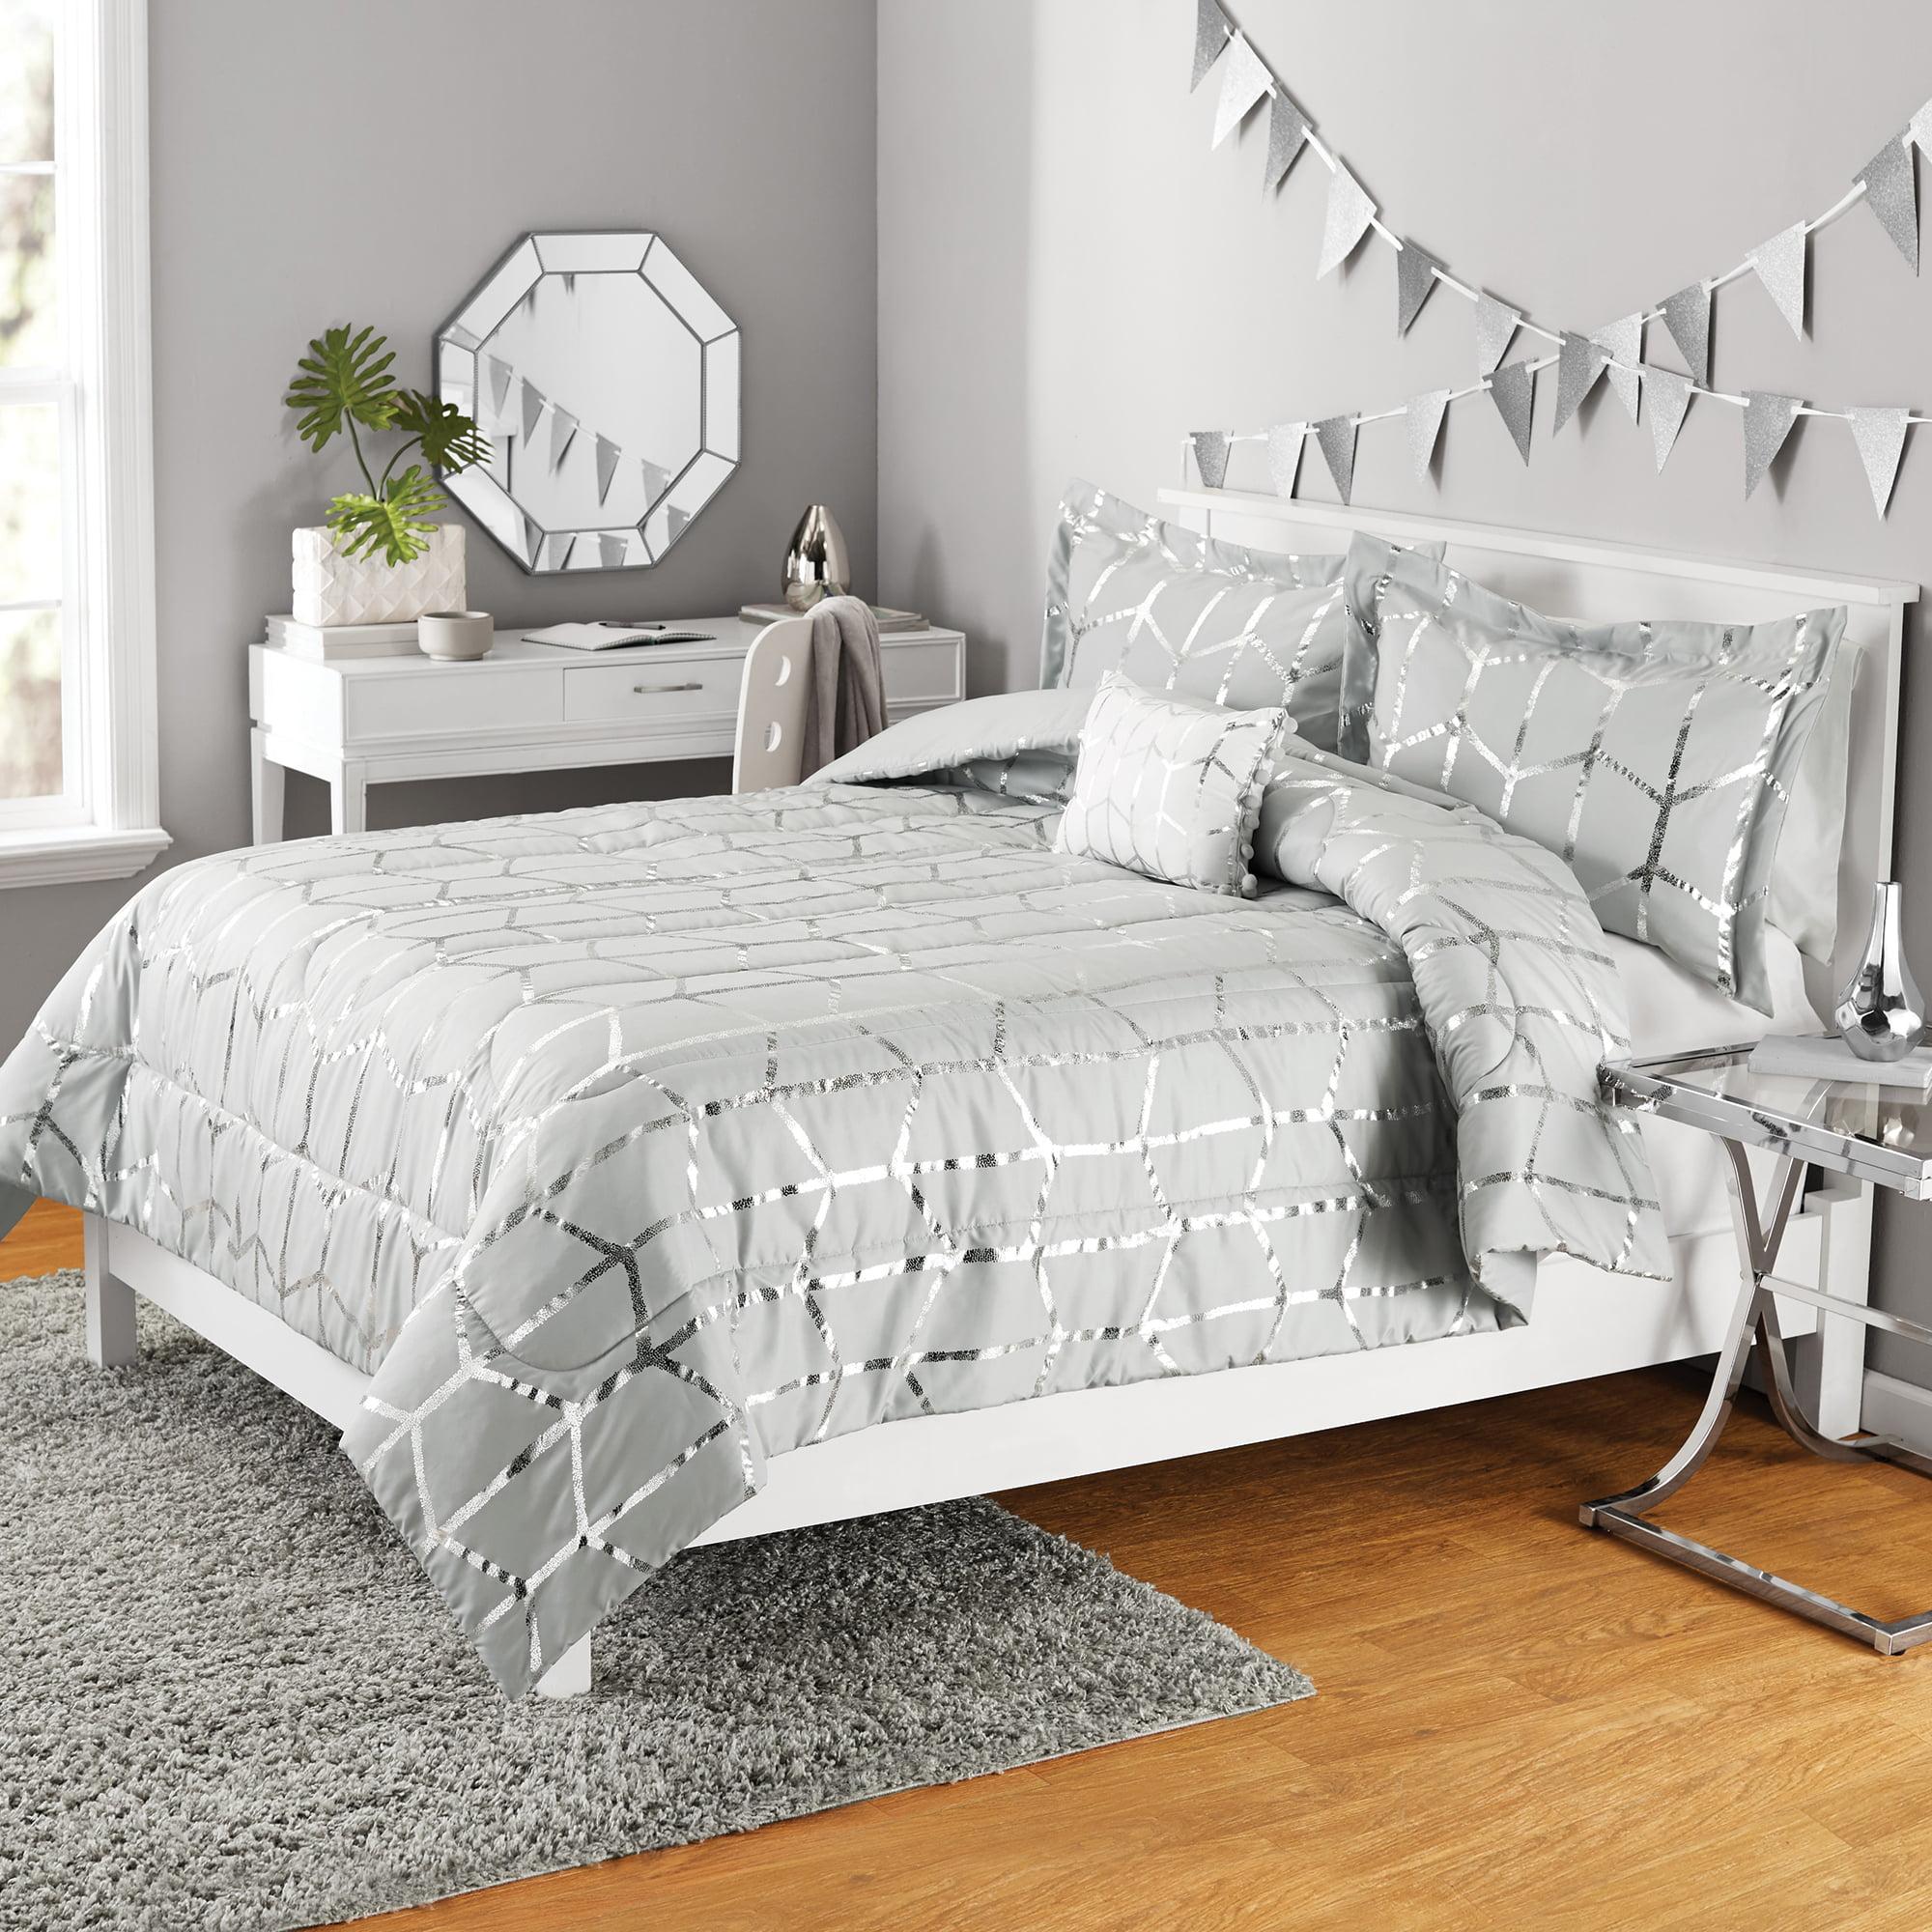 silk metallic cover and bedding kevin l white includes brien shams velvet obrien a willow o studio pillow duvet